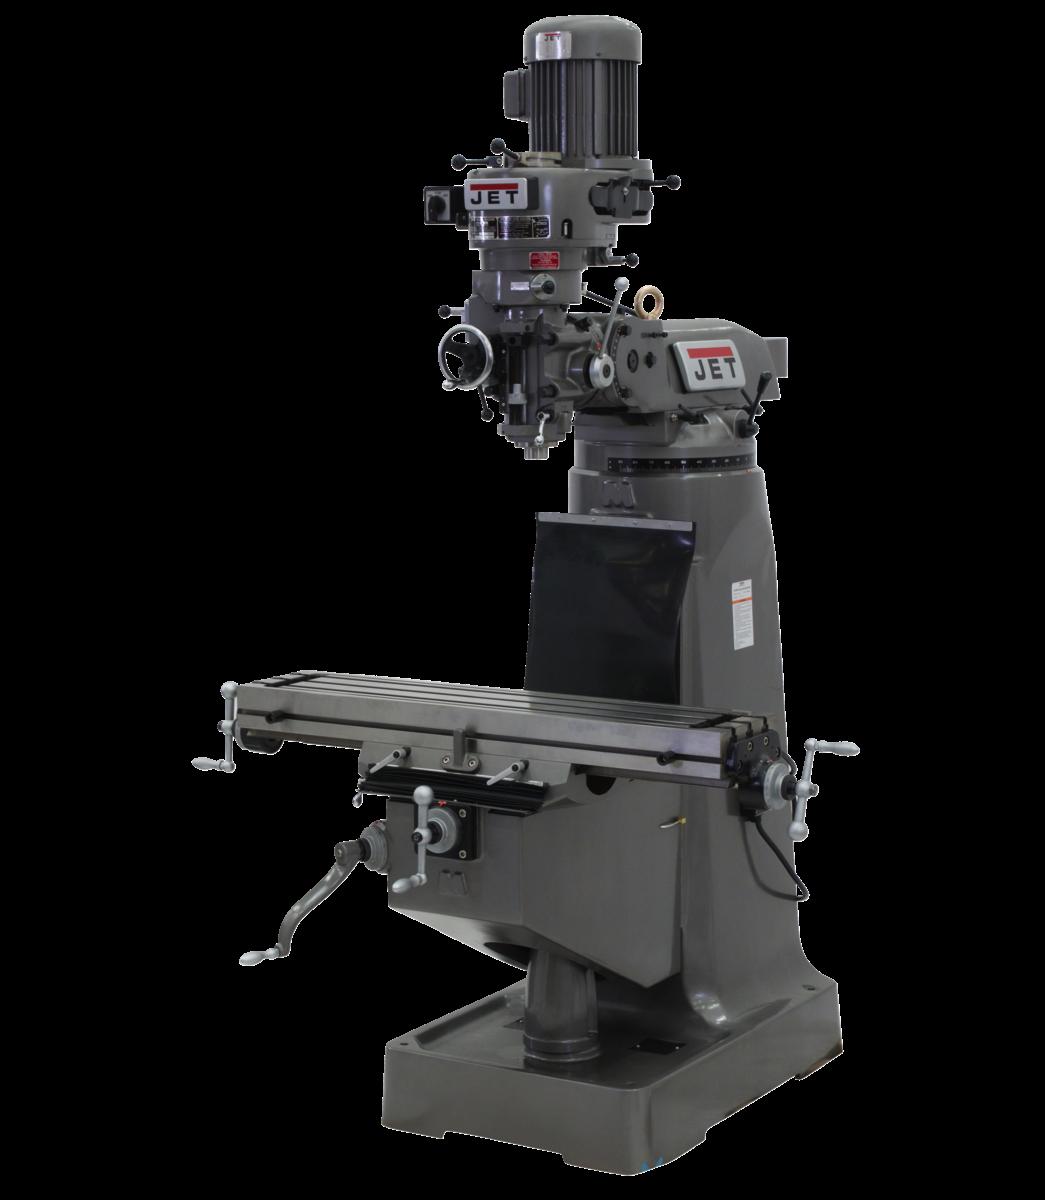 JTM-2 Step Pulley Milling Machine 115/230V 1Ph